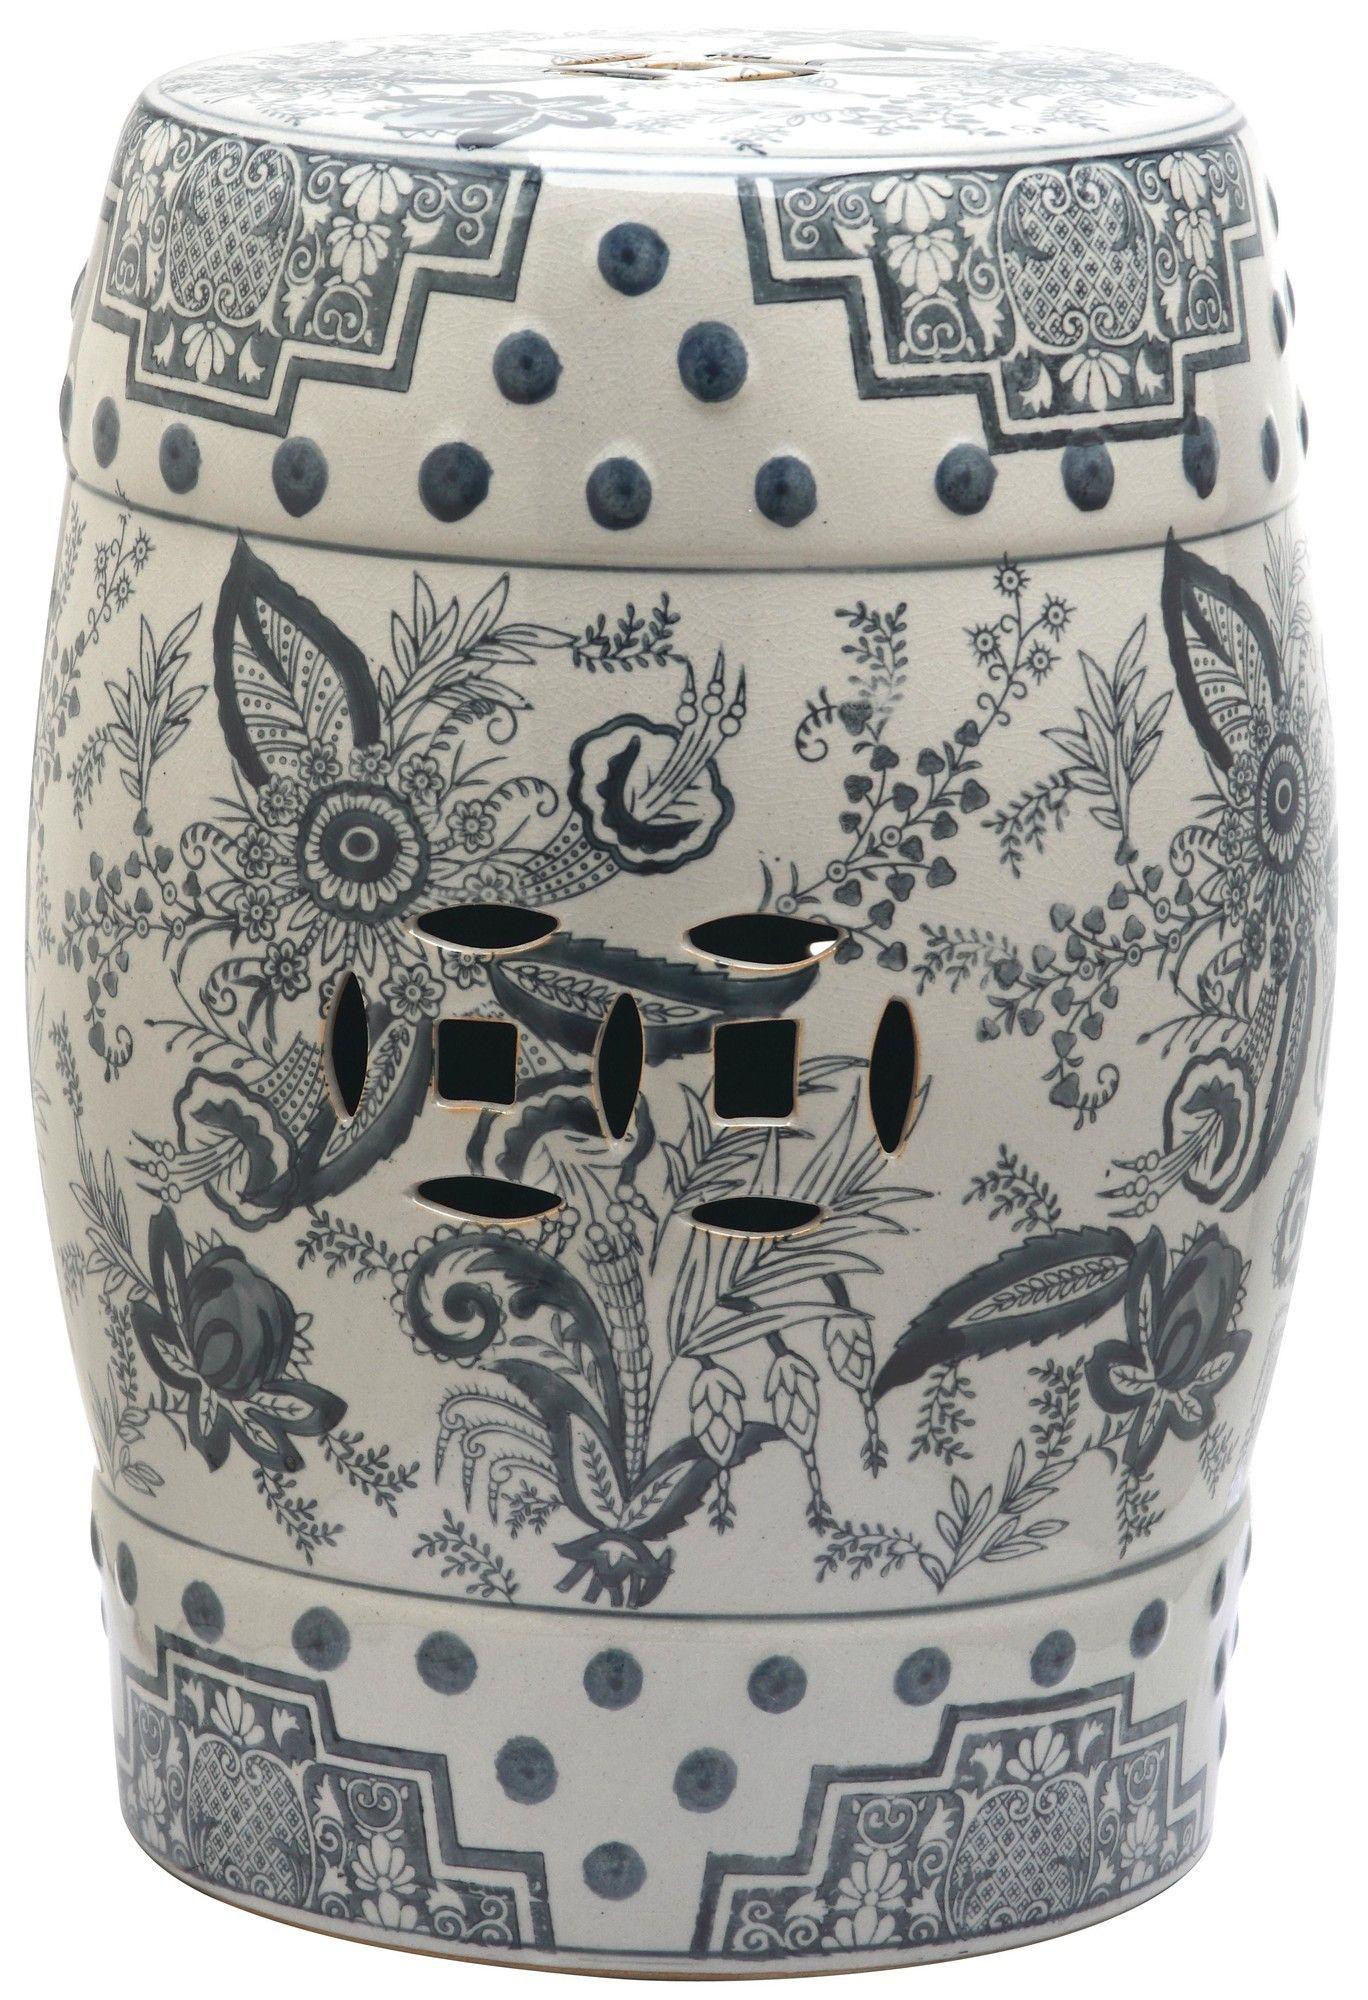 Super Pin By Leila Zayed On Porch Pagoda Garden Ceramic Garden Machost Co Dining Chair Design Ideas Machostcouk